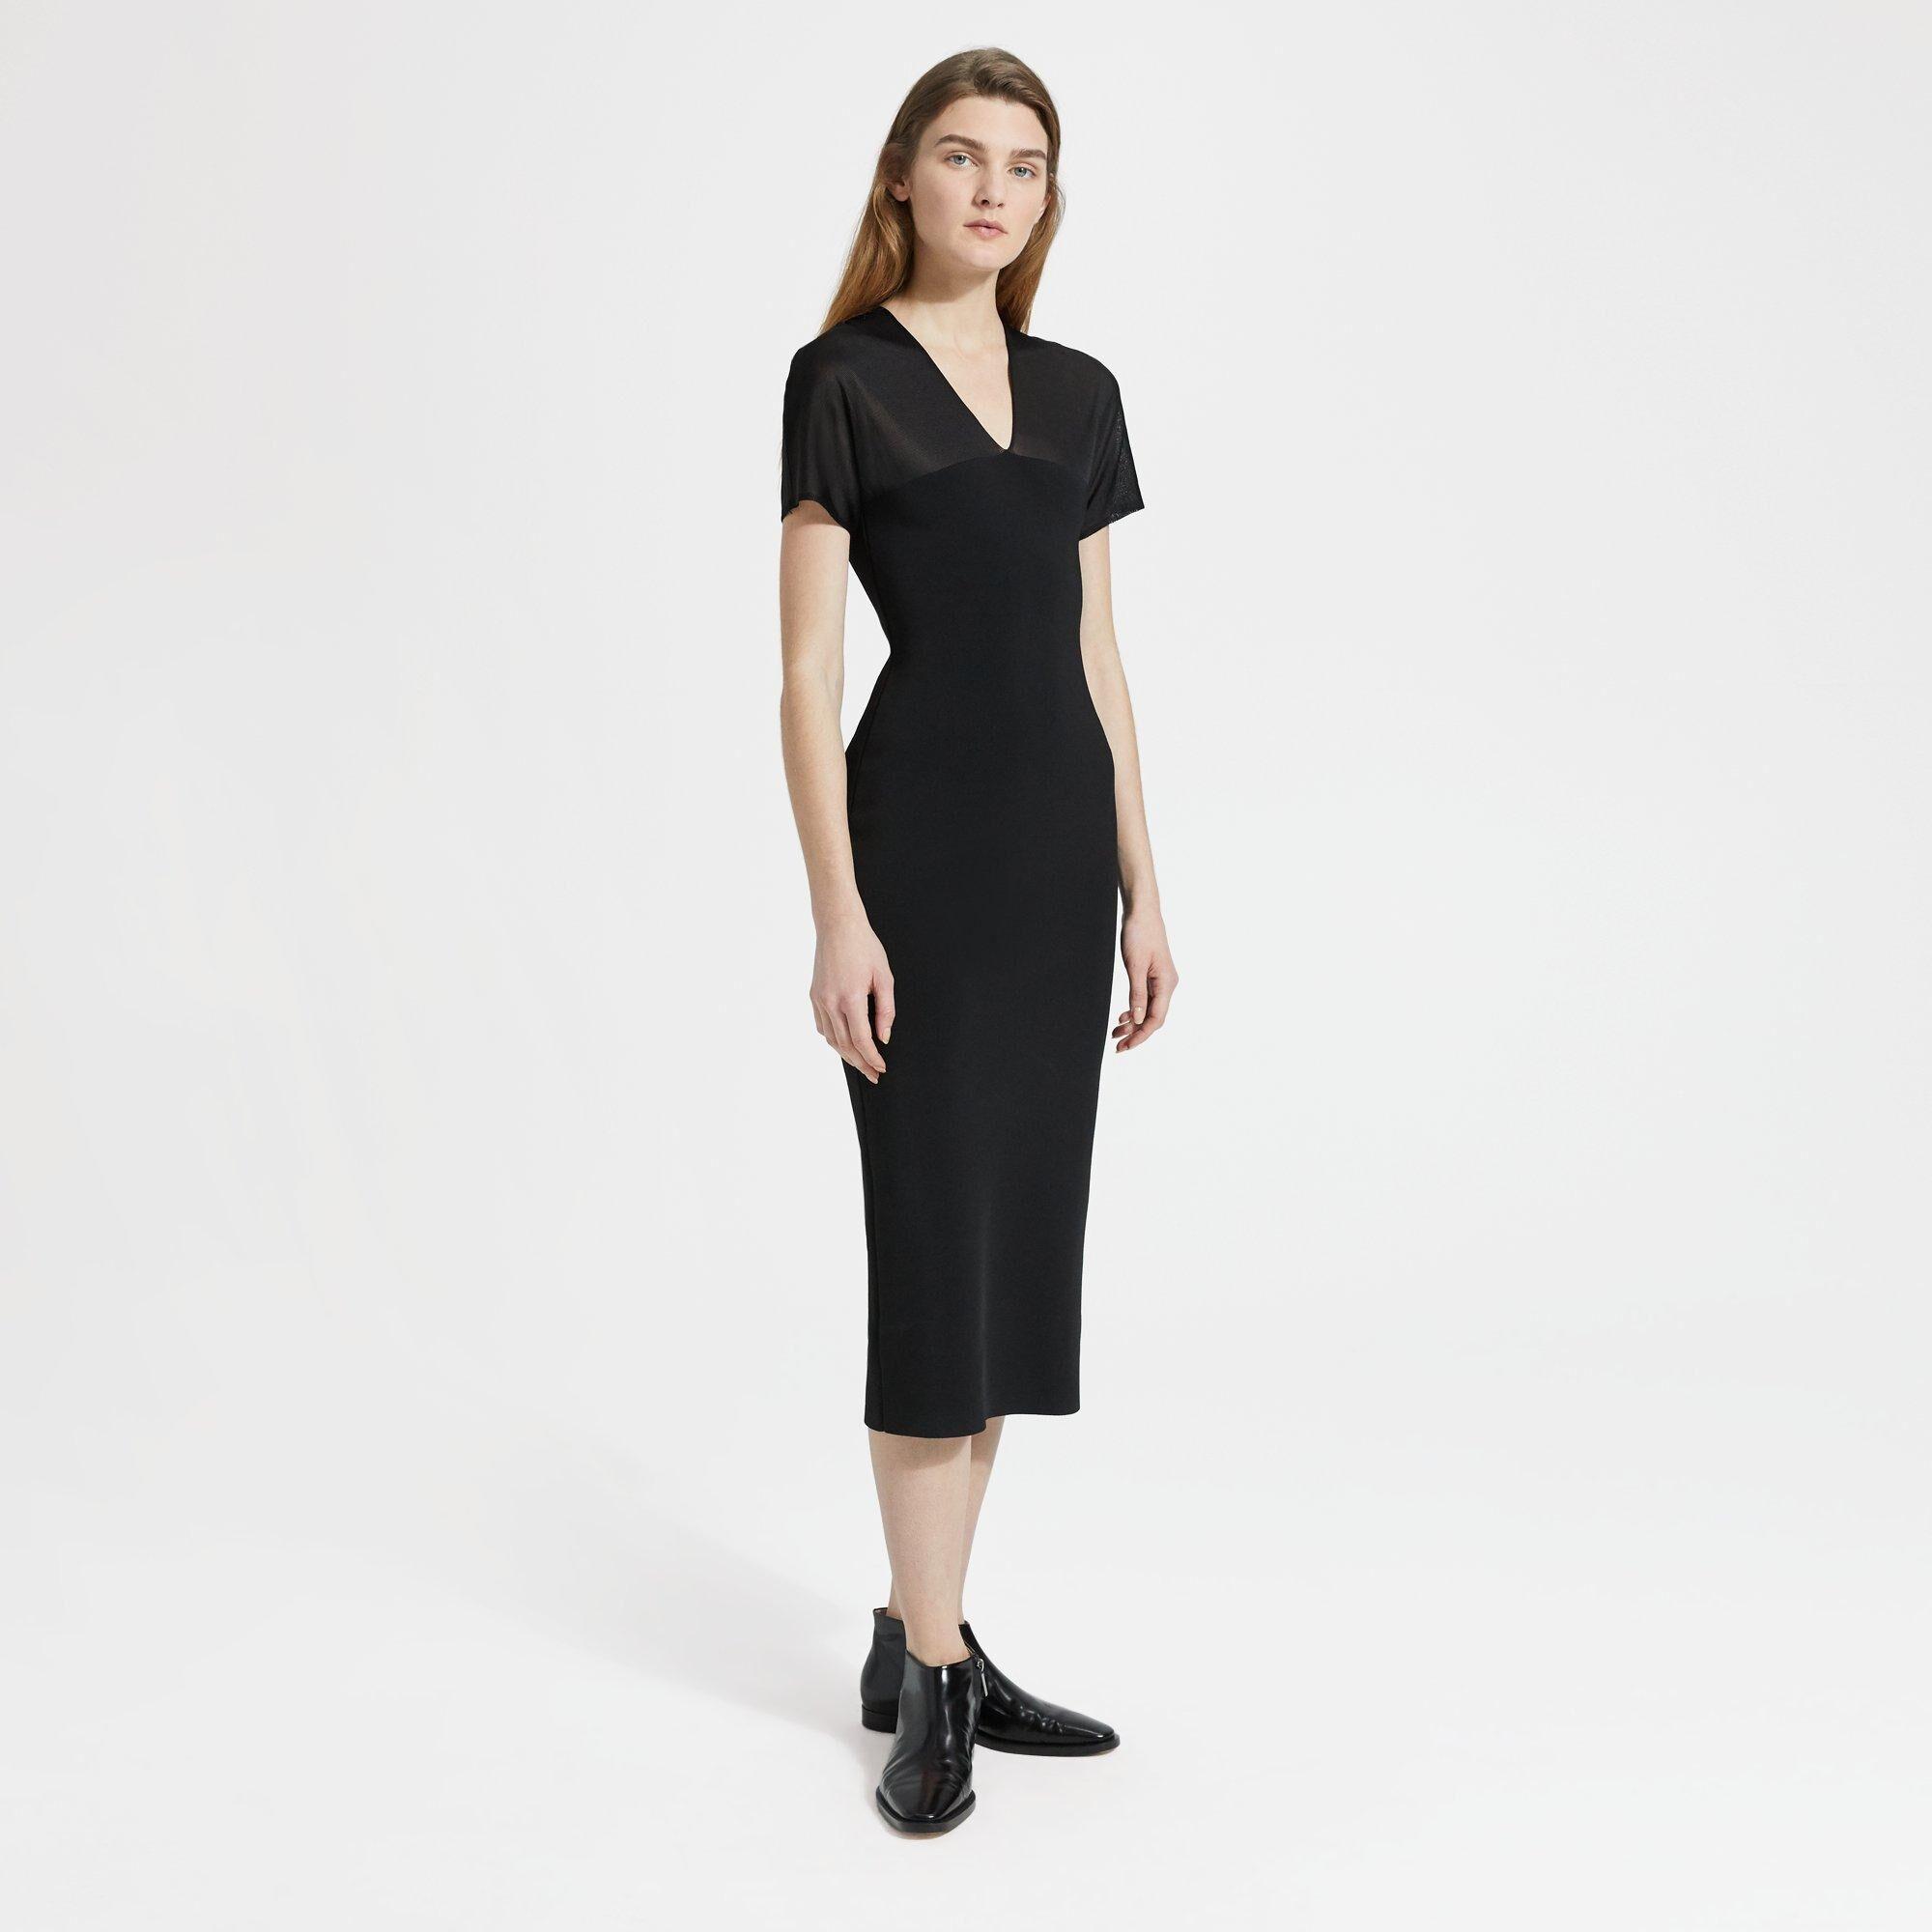 Theory Kimono Dress  - BLACK - female - Size: Large